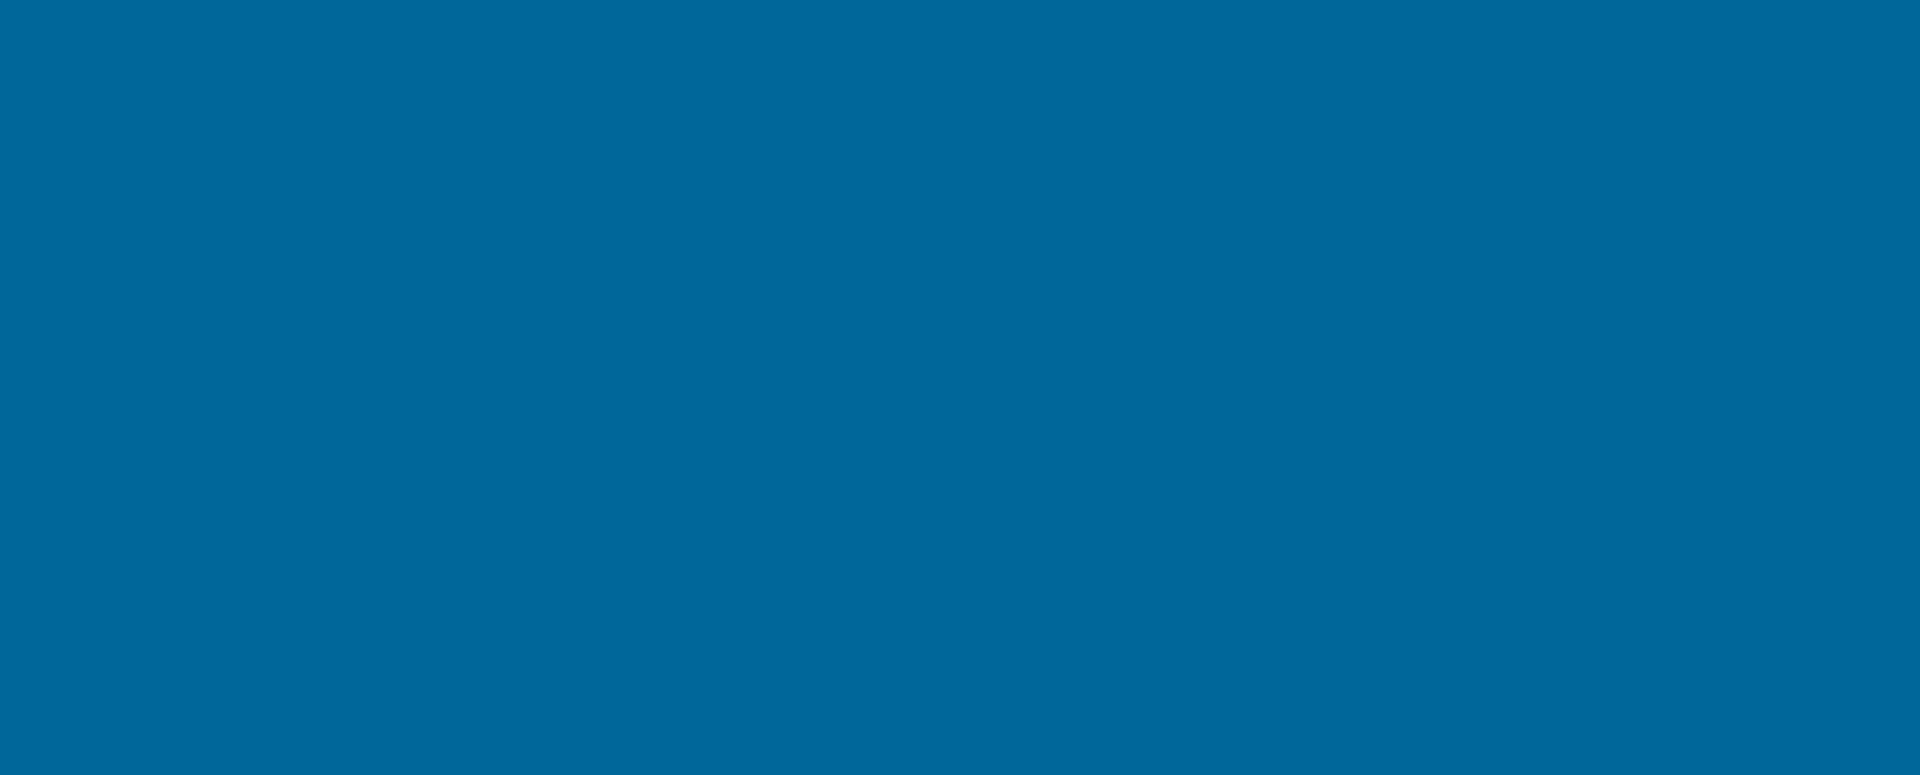 home-scorrevole-blu1920x775